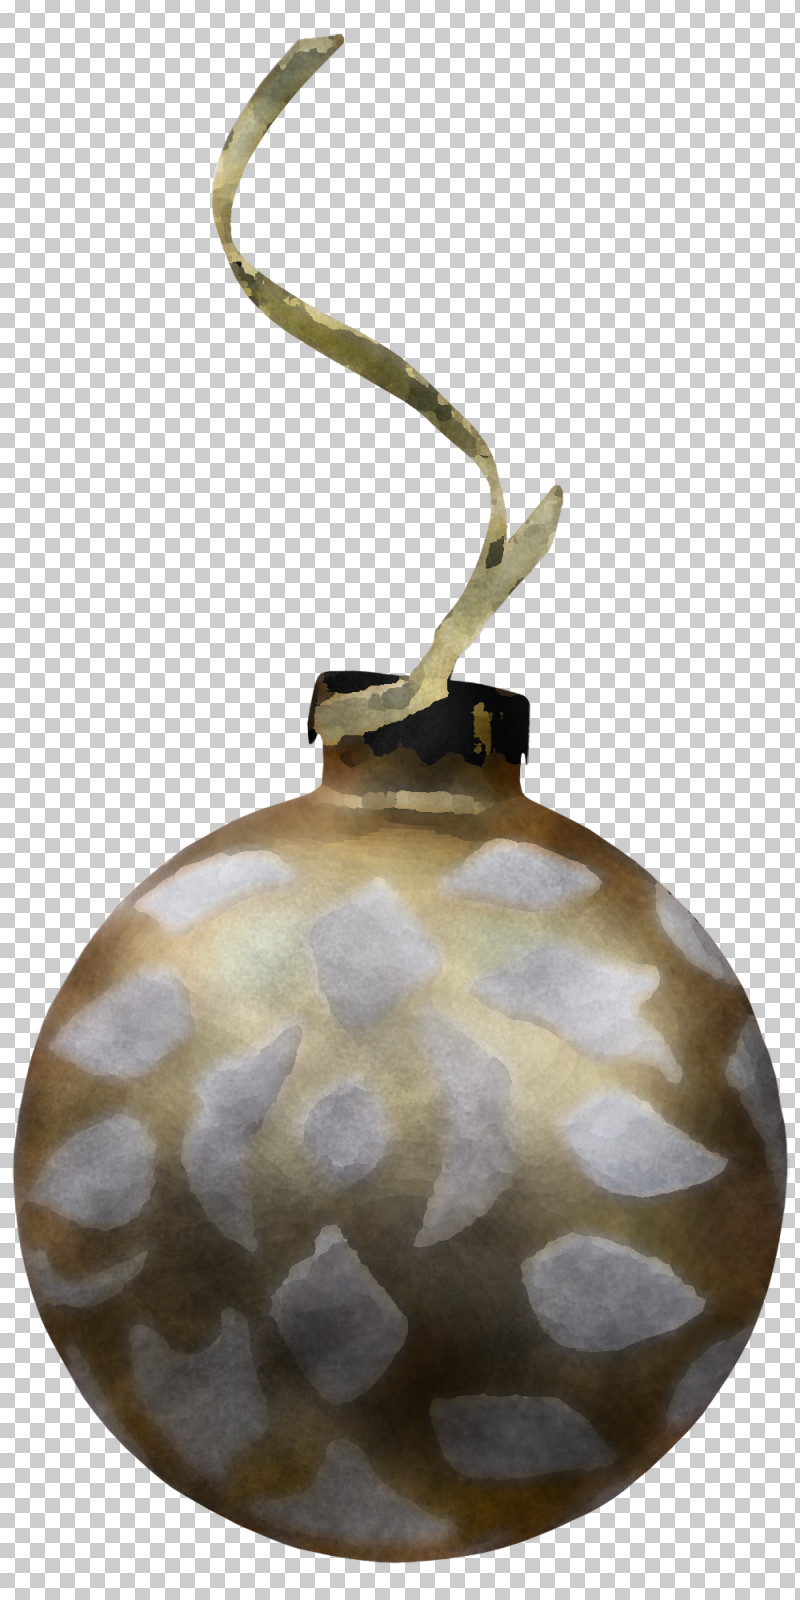 Christmas Bulbs Christmas Balls Christmas Bubbles PNG, Clipart, Beige, Christmas Balls, Christmas Bubbles, Christmas Bulbs, Christmas Ornament Free PNG Download